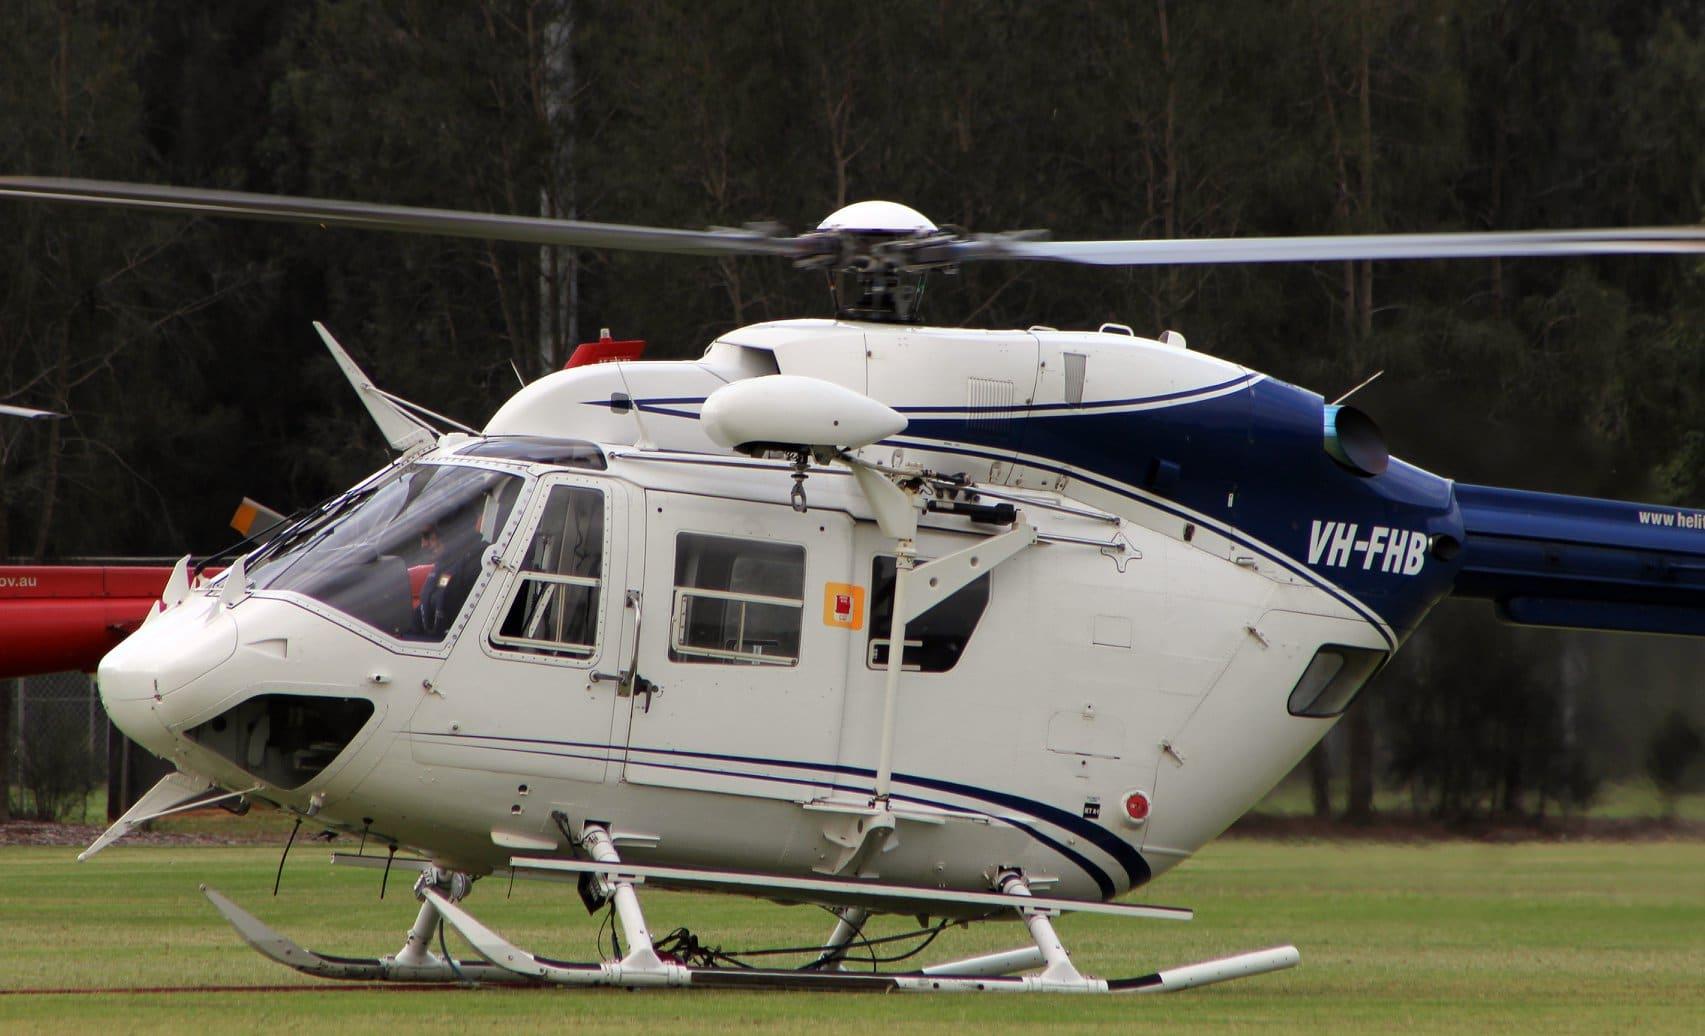 Helitreck VH-FHB BK117 Helicopter 2